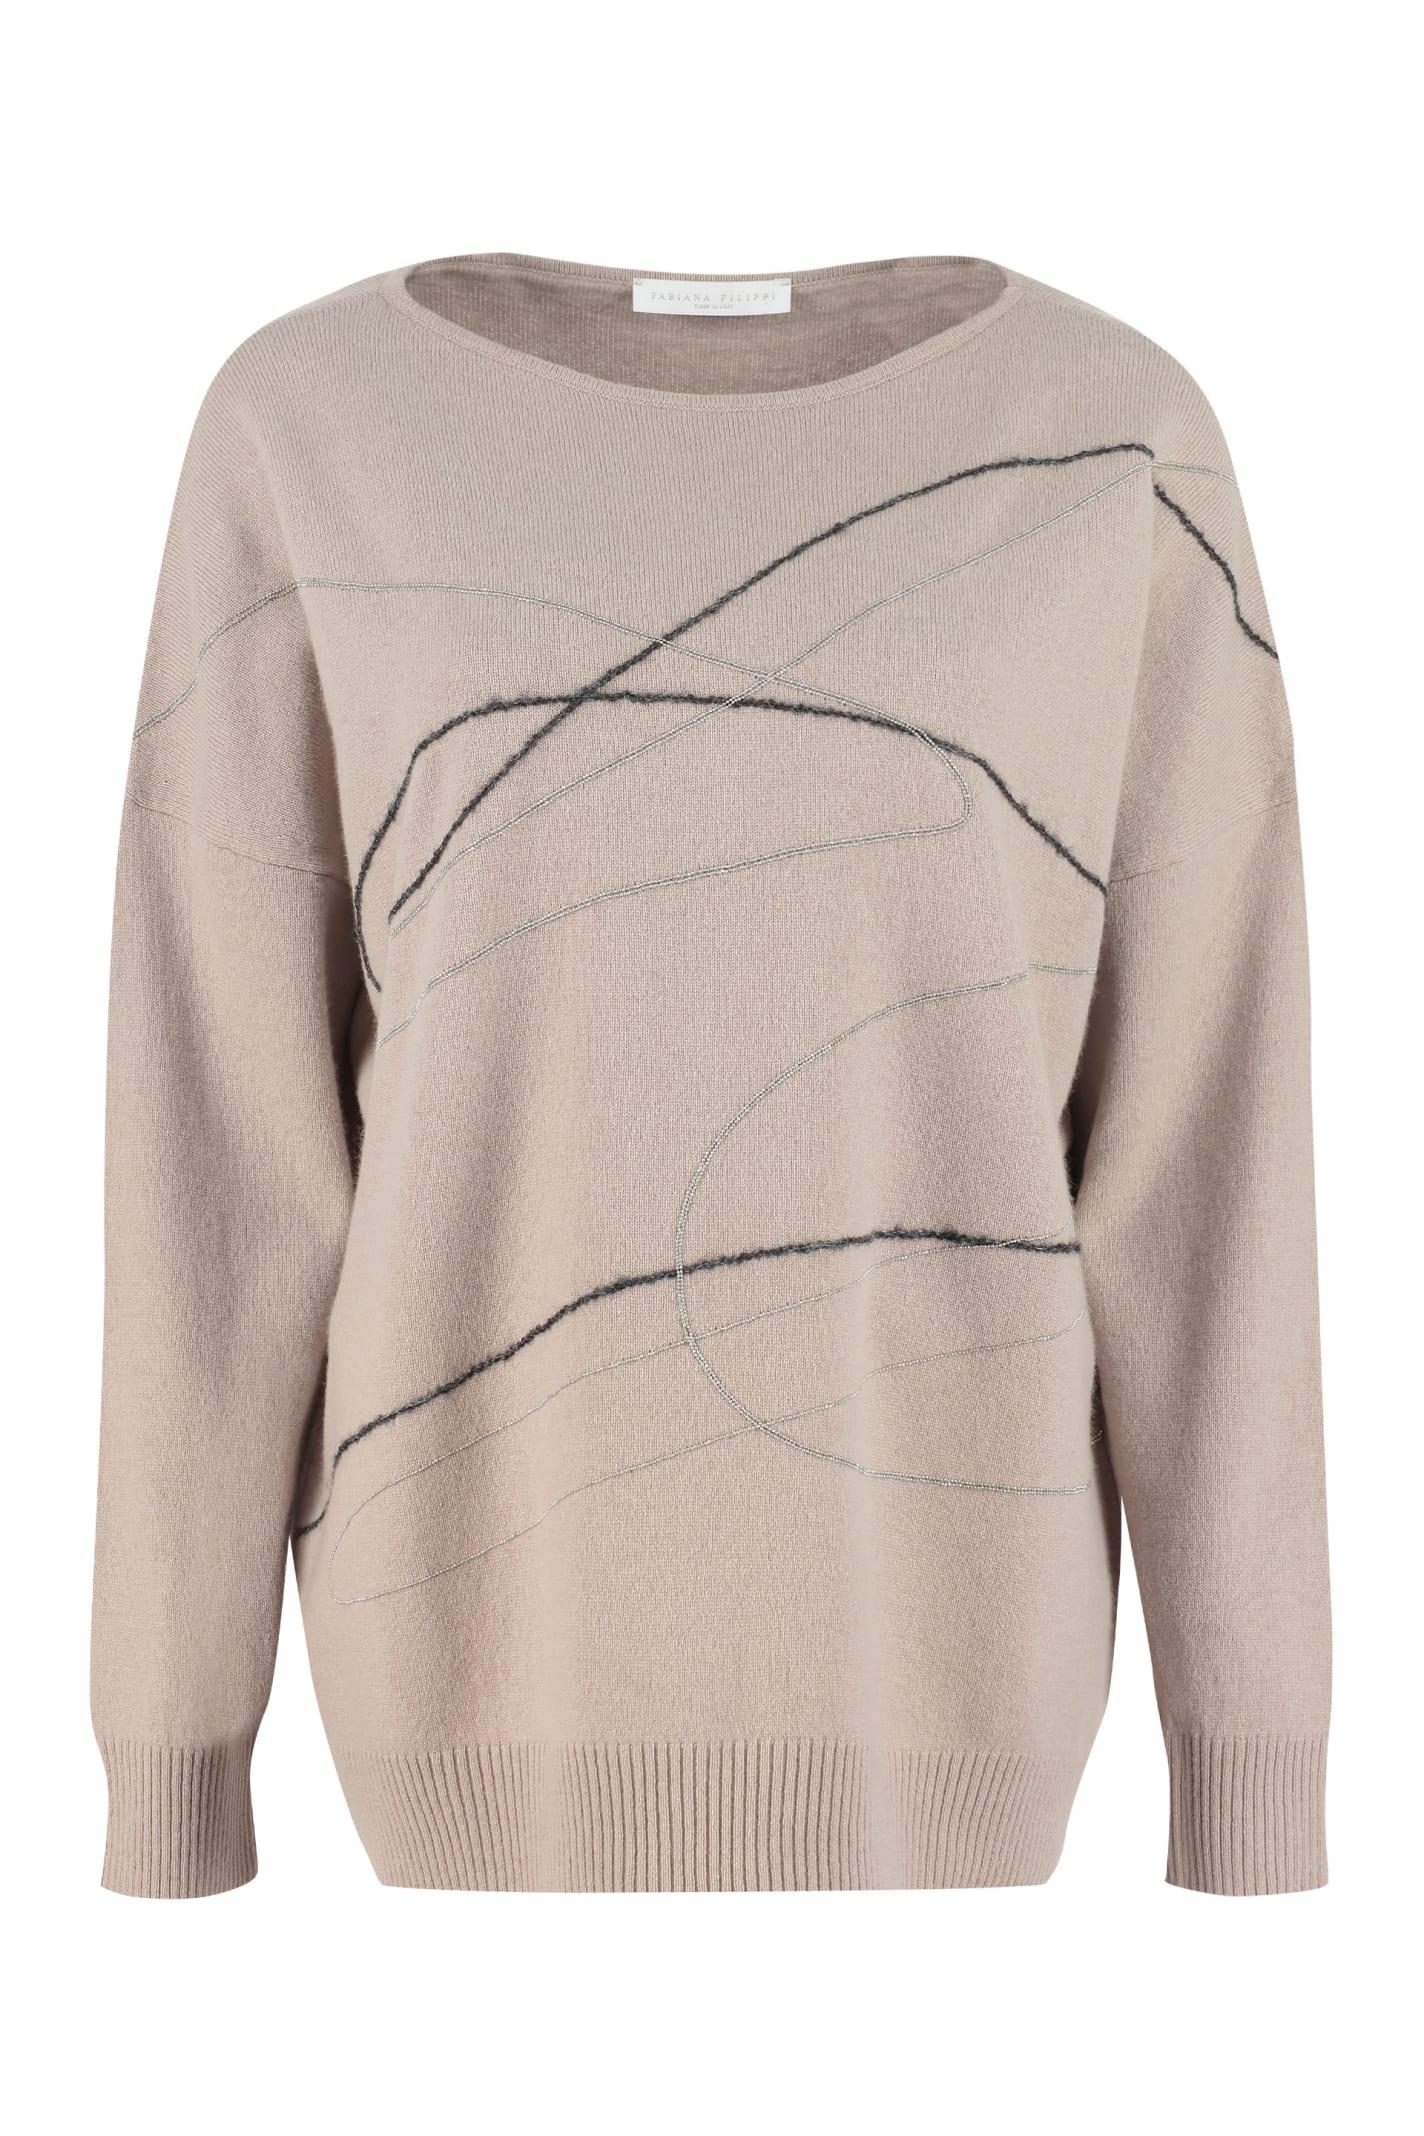 Fabiana Filippi Wool, Cashmere And Silk Blend Sweater In Turtledove